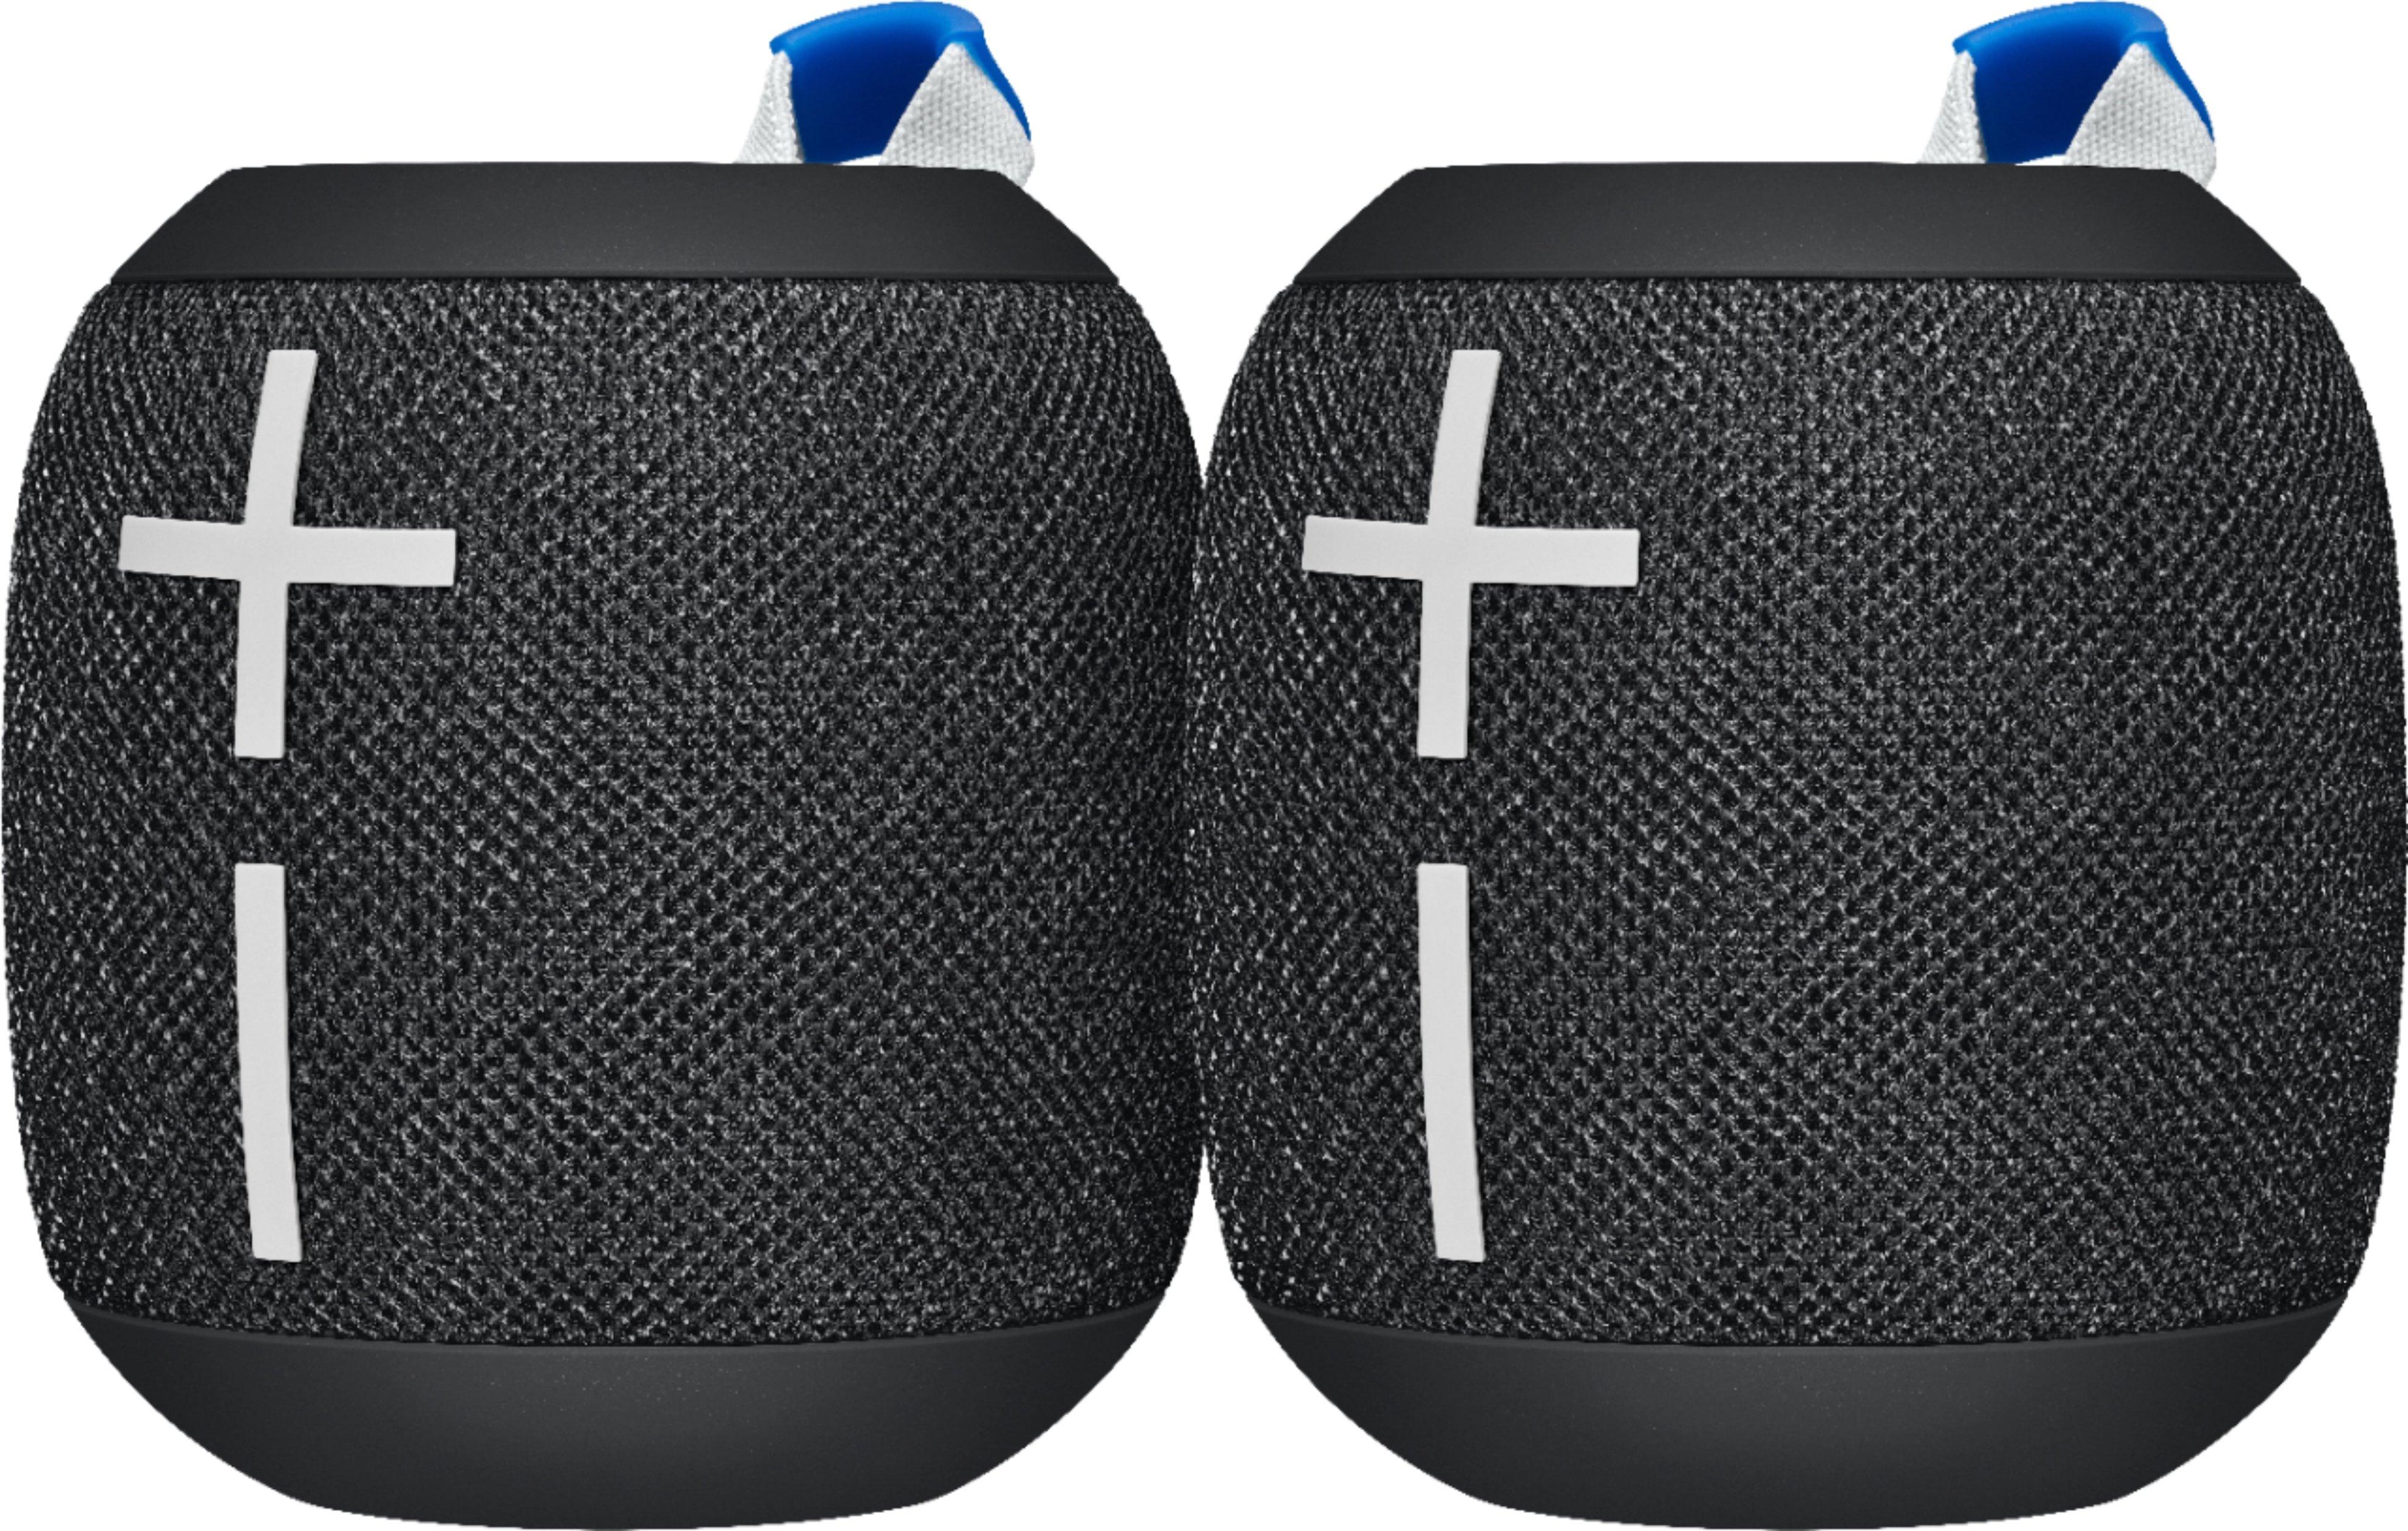 UE Wonderboom Speakers any 2 for £71.98 @ Costco